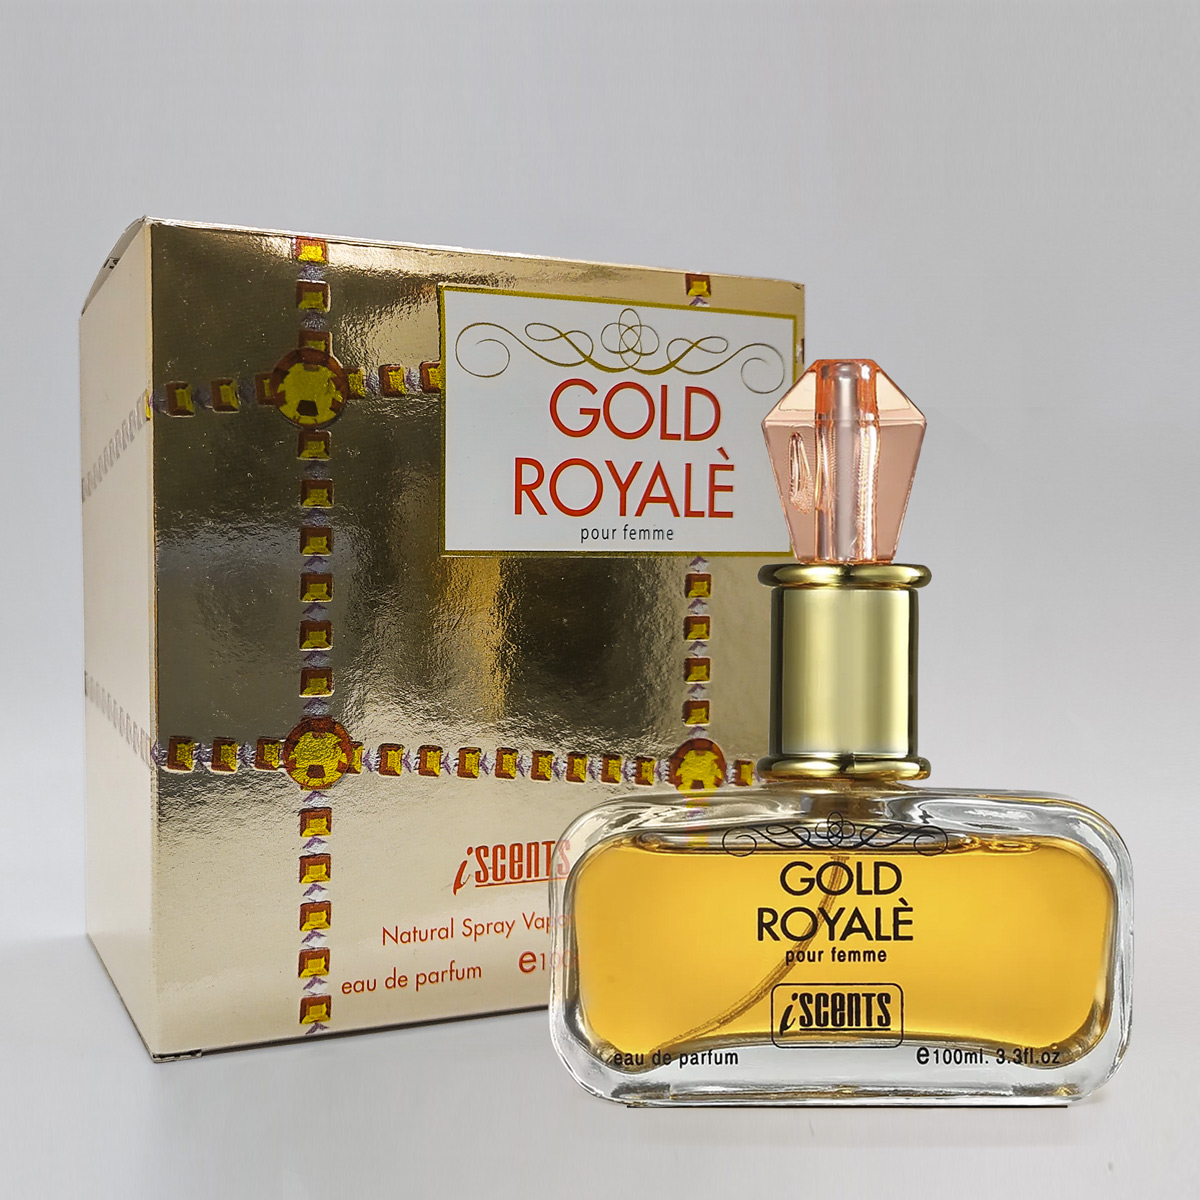 Perfume Gold Royale Feminino edp 100ml - I scents